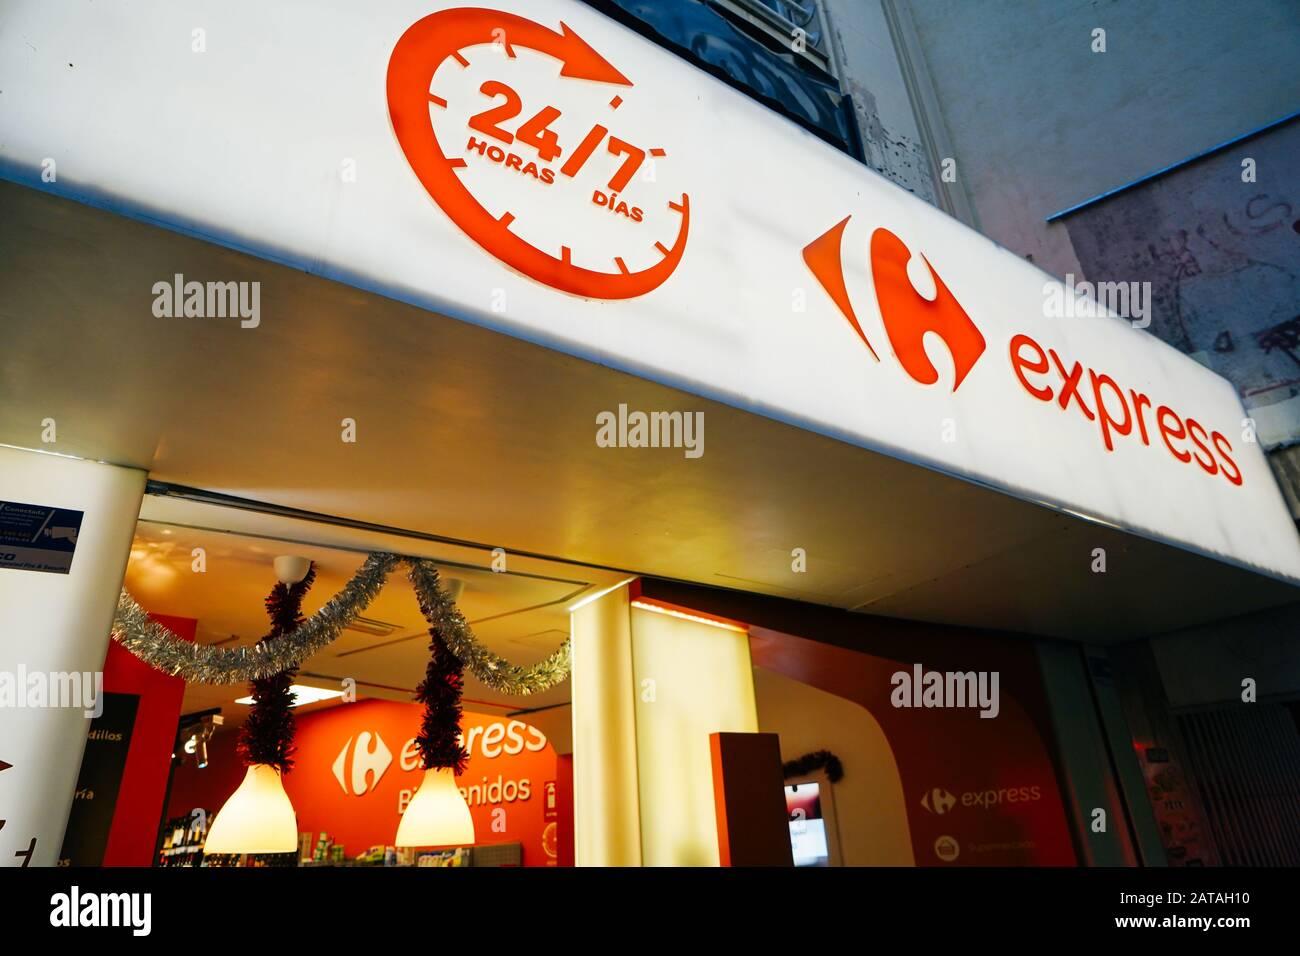 https www alamy com madrid spain december 26th 2019 carrefour express supermarket image341981612 html